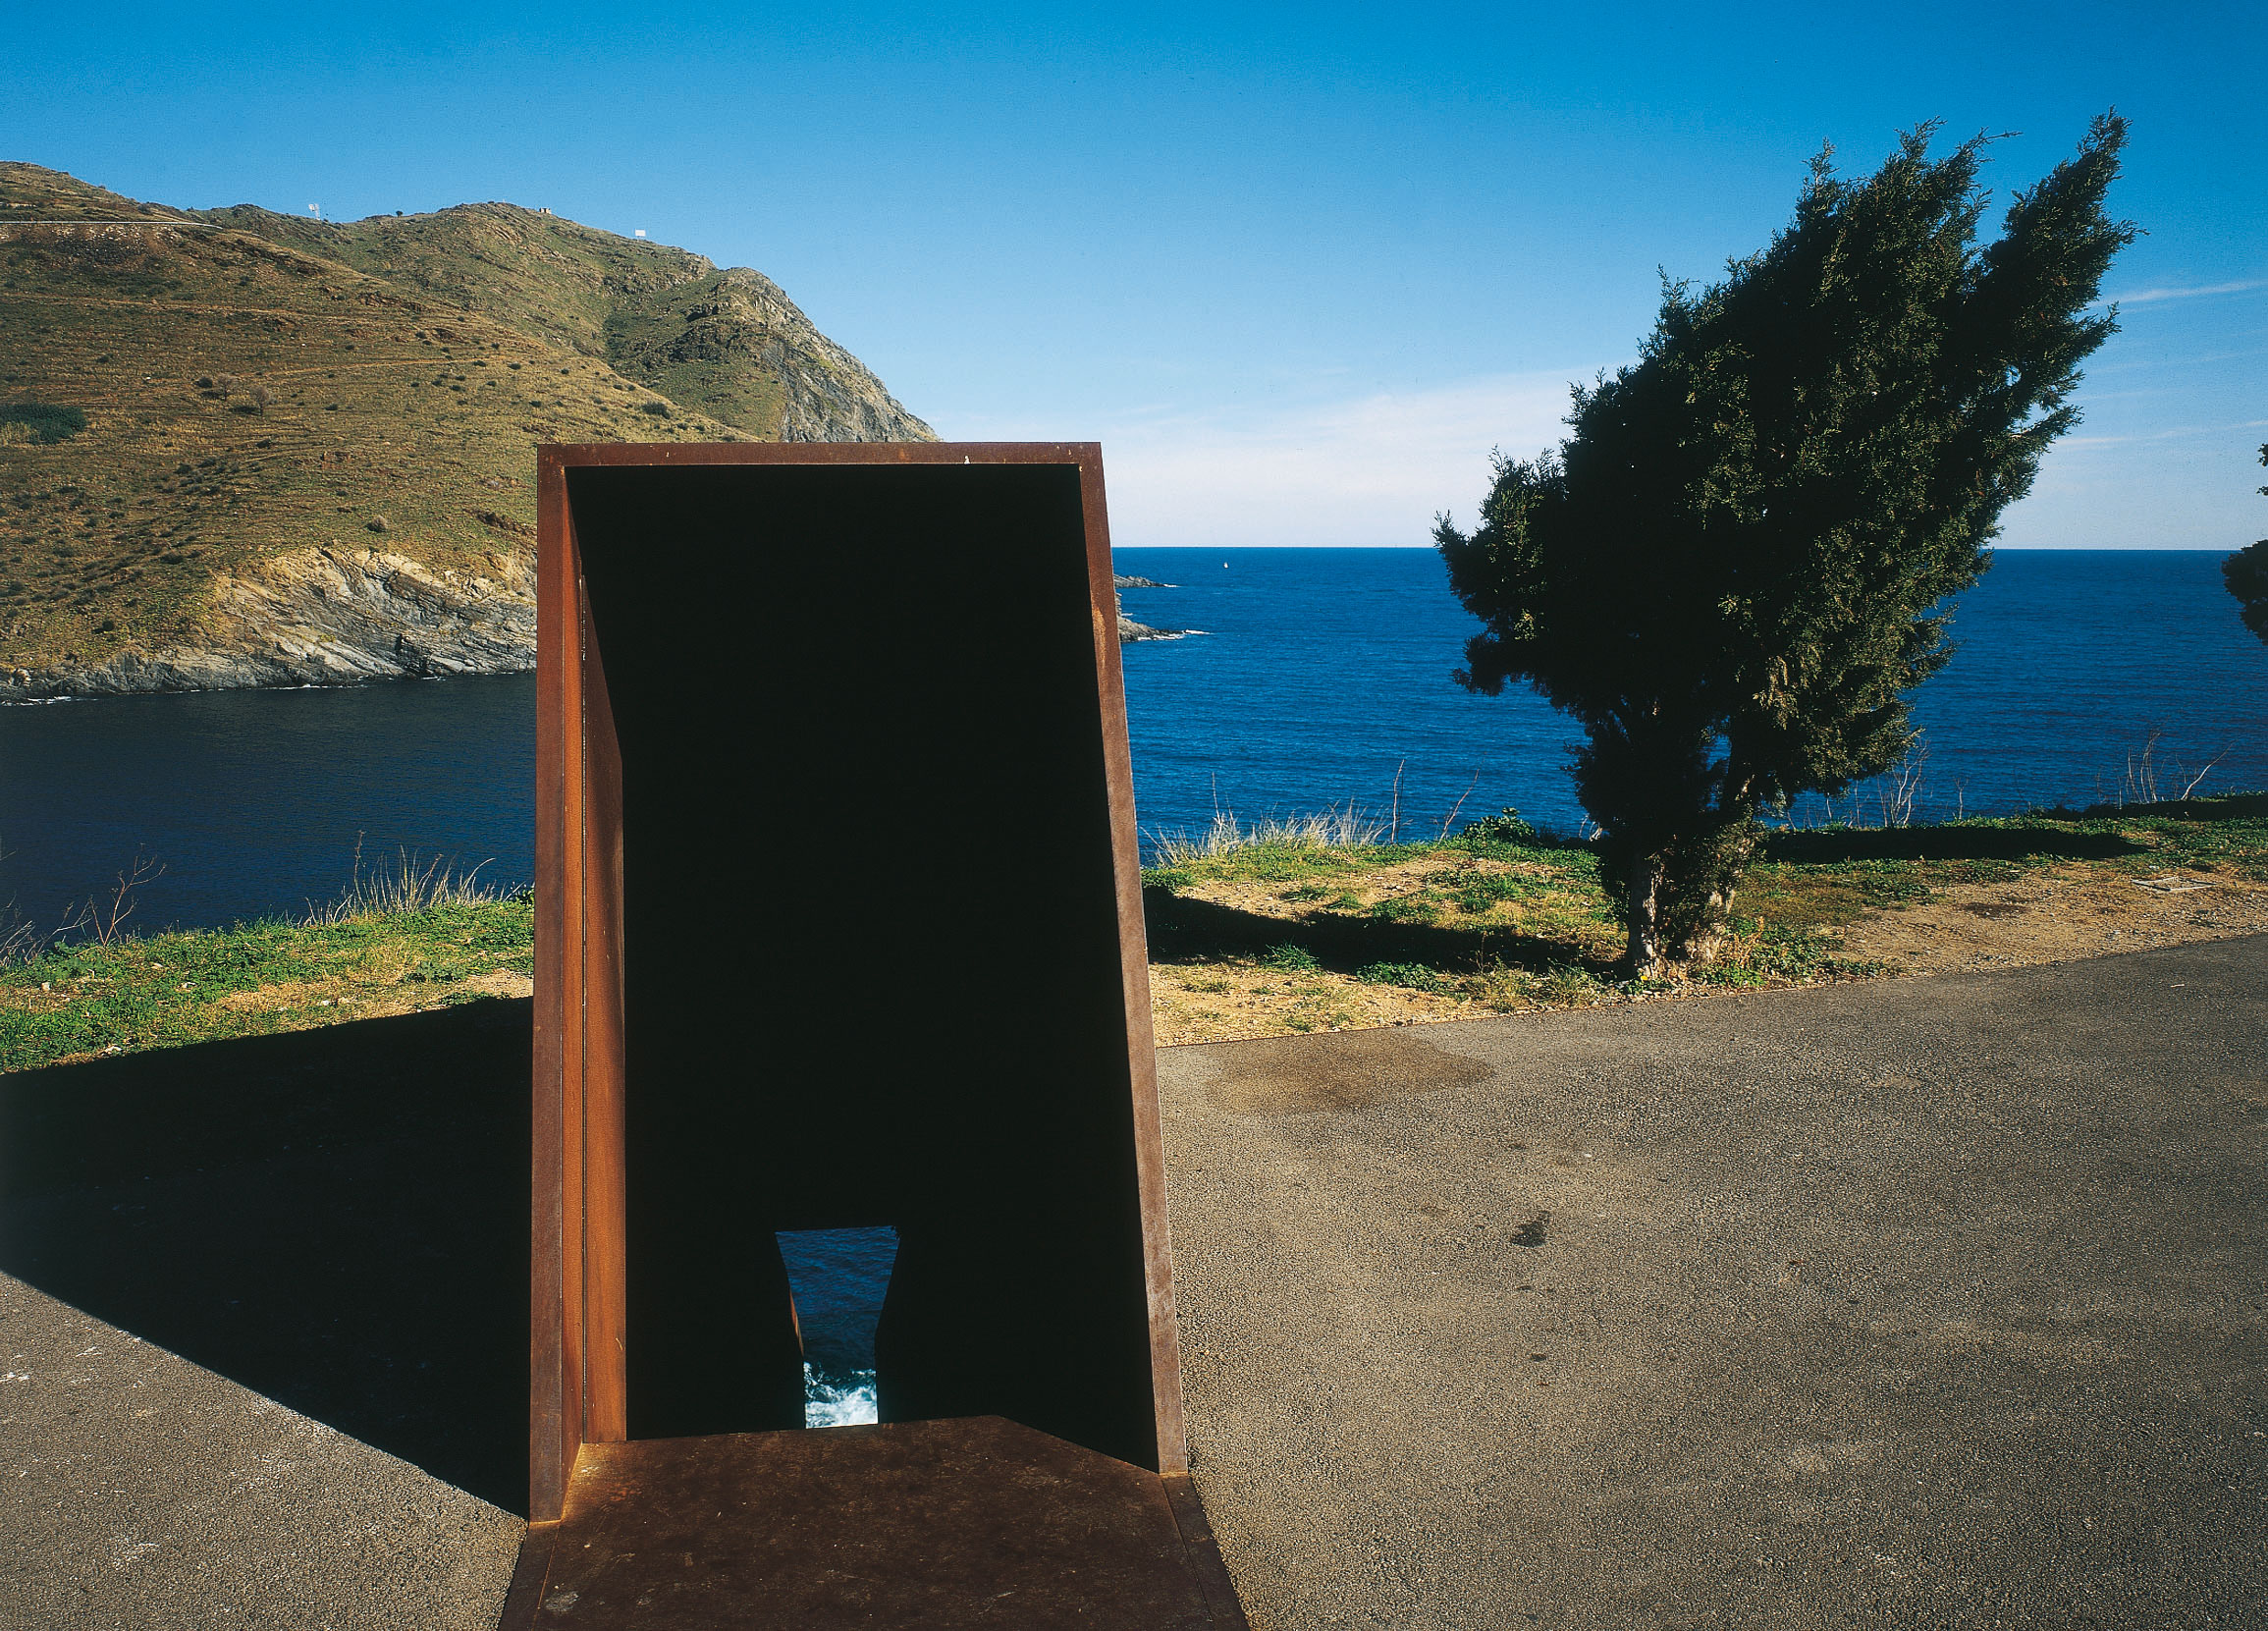 20th Anniversary Of The Passages Memorial To Walter Benjamin Jeanne Bucher Jaeger Art